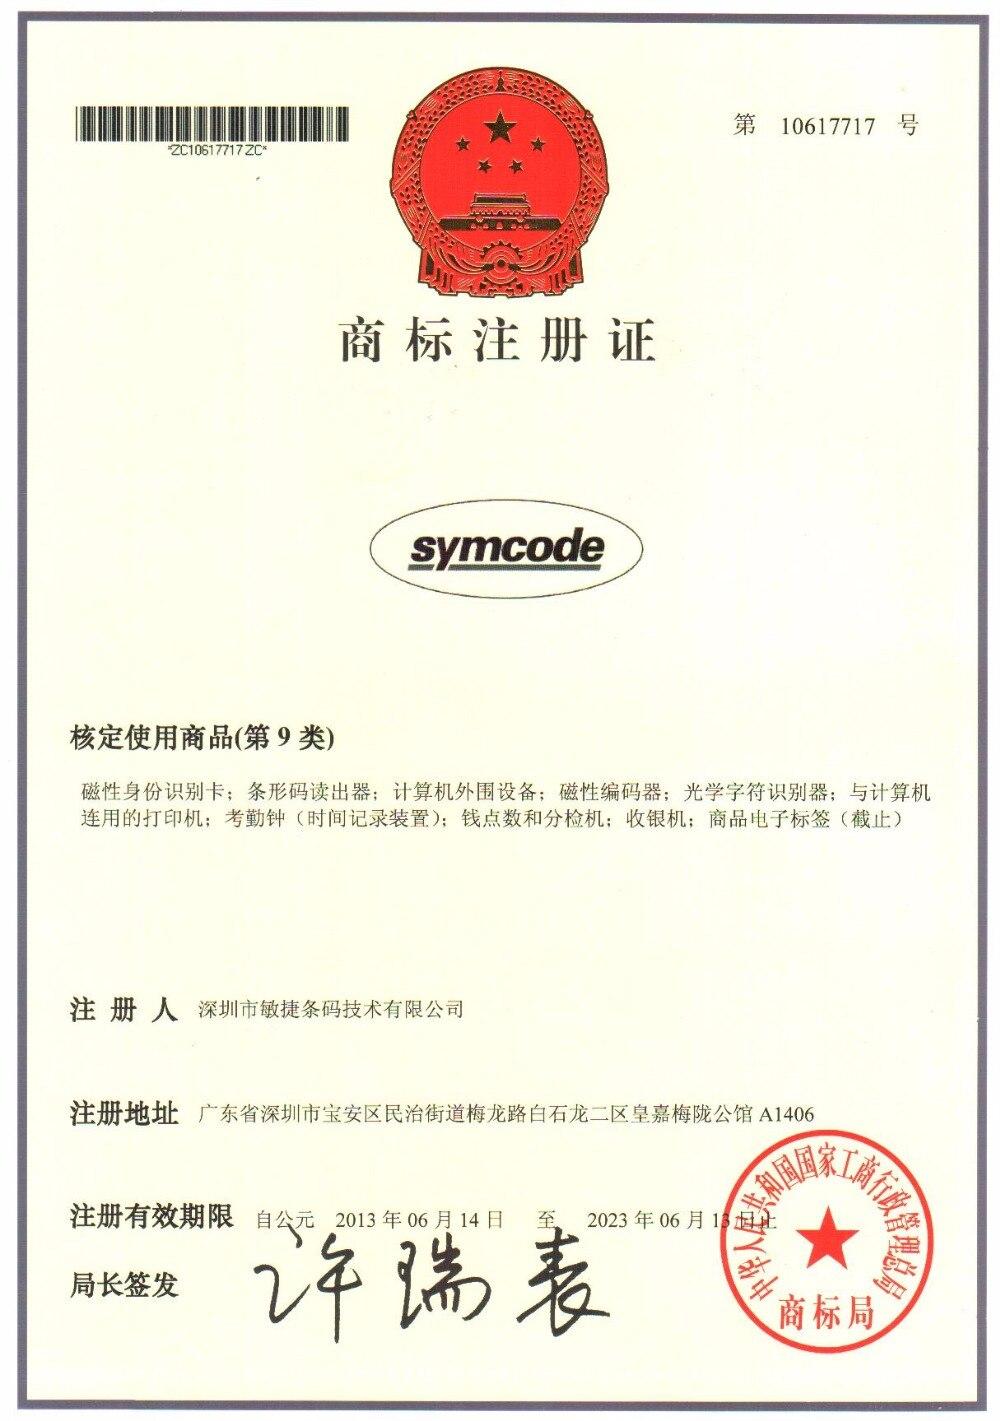 symcode